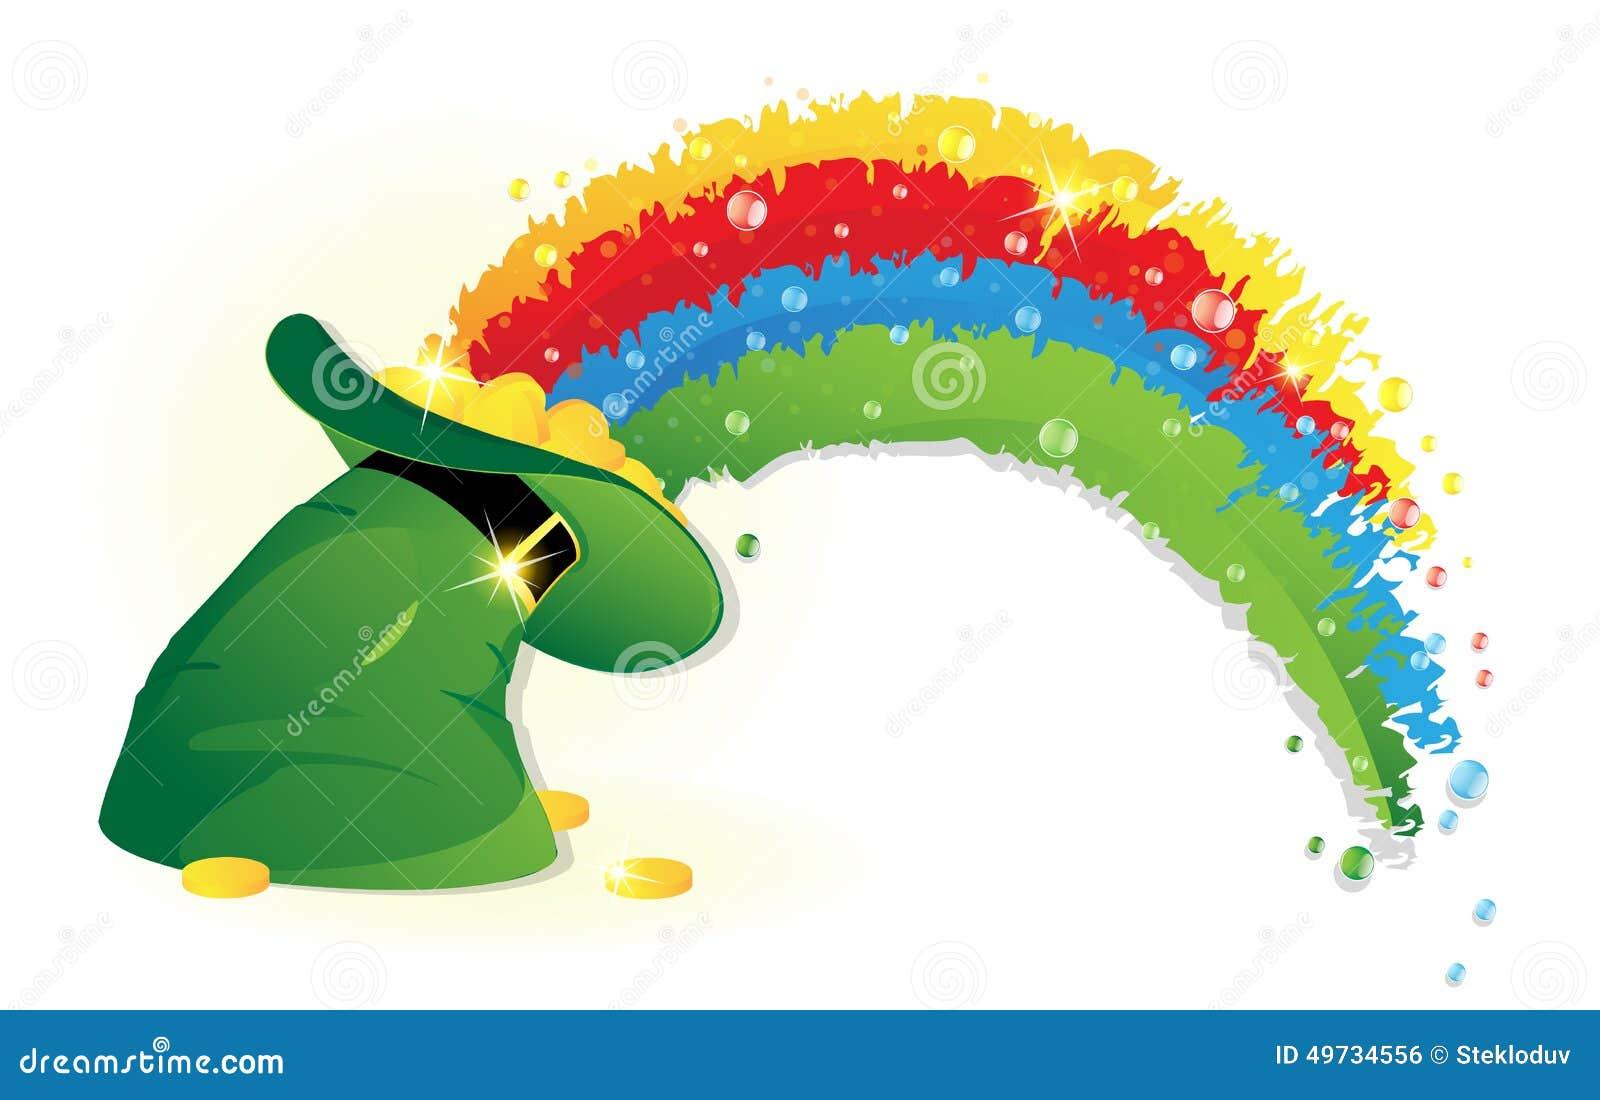 Uncategorized Leprechauns And Rainbows rainbow and leprechaun hat stock vector image 49734556 royalty free download leprechaun